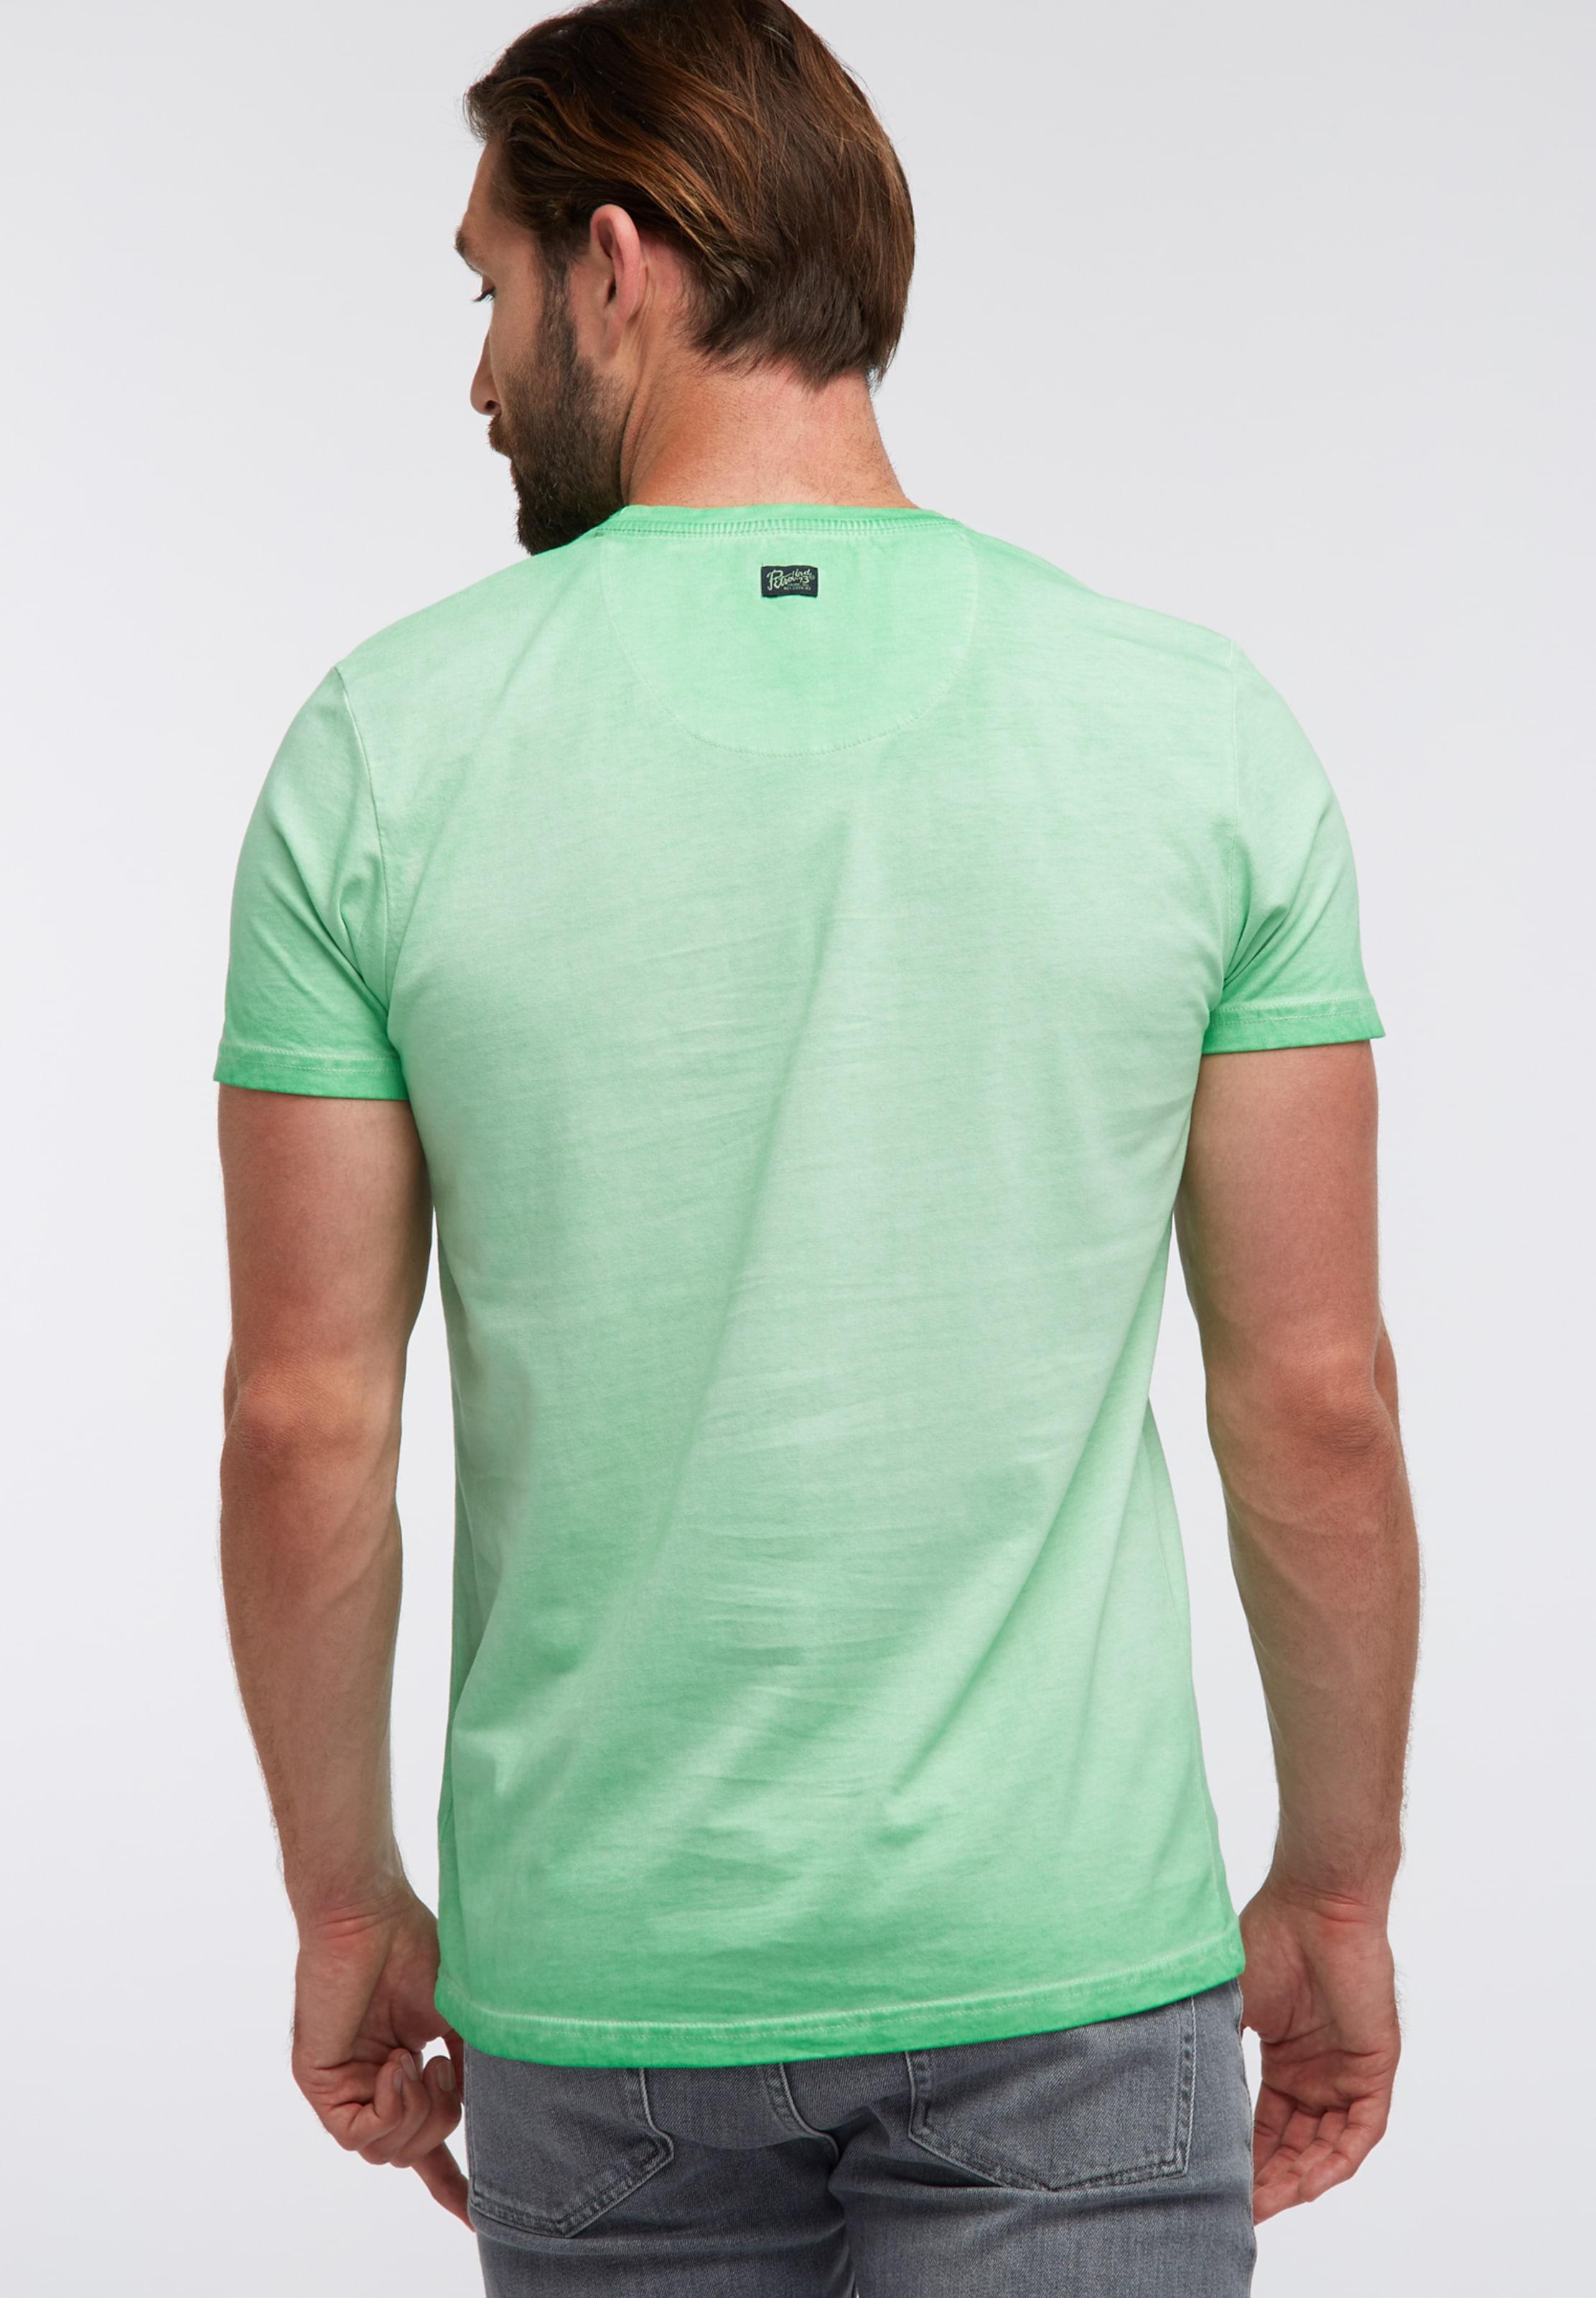 Petrol T Industries shirt Grün In hCtsQrd